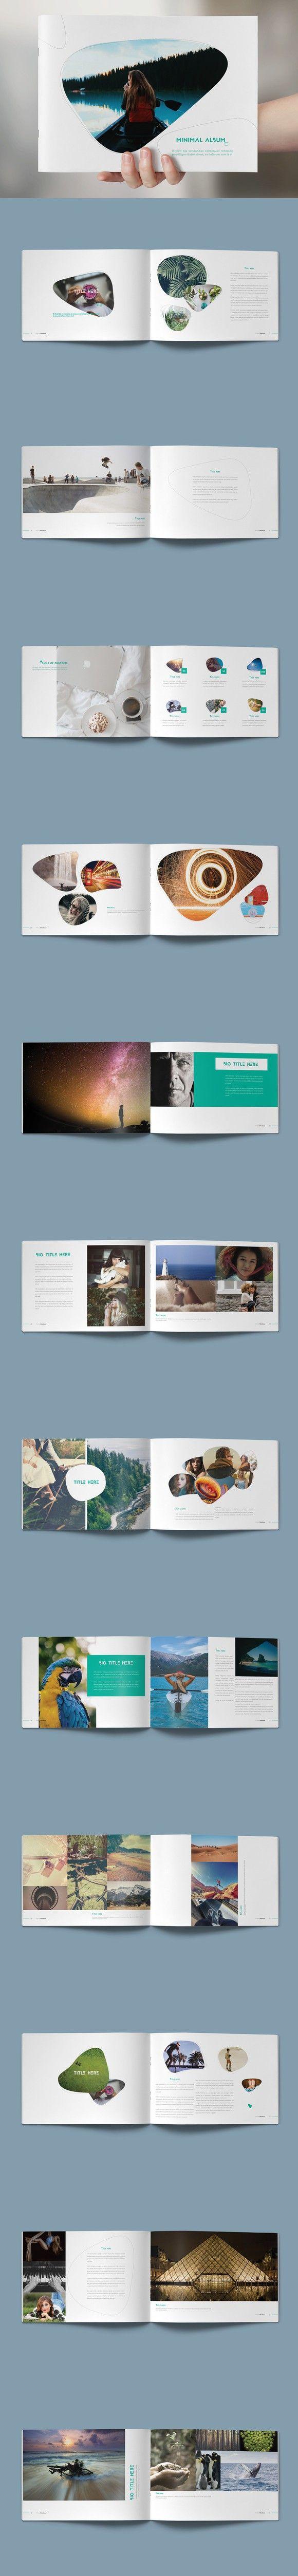 Minimal Photo Album. Brochure Templates. $15.00